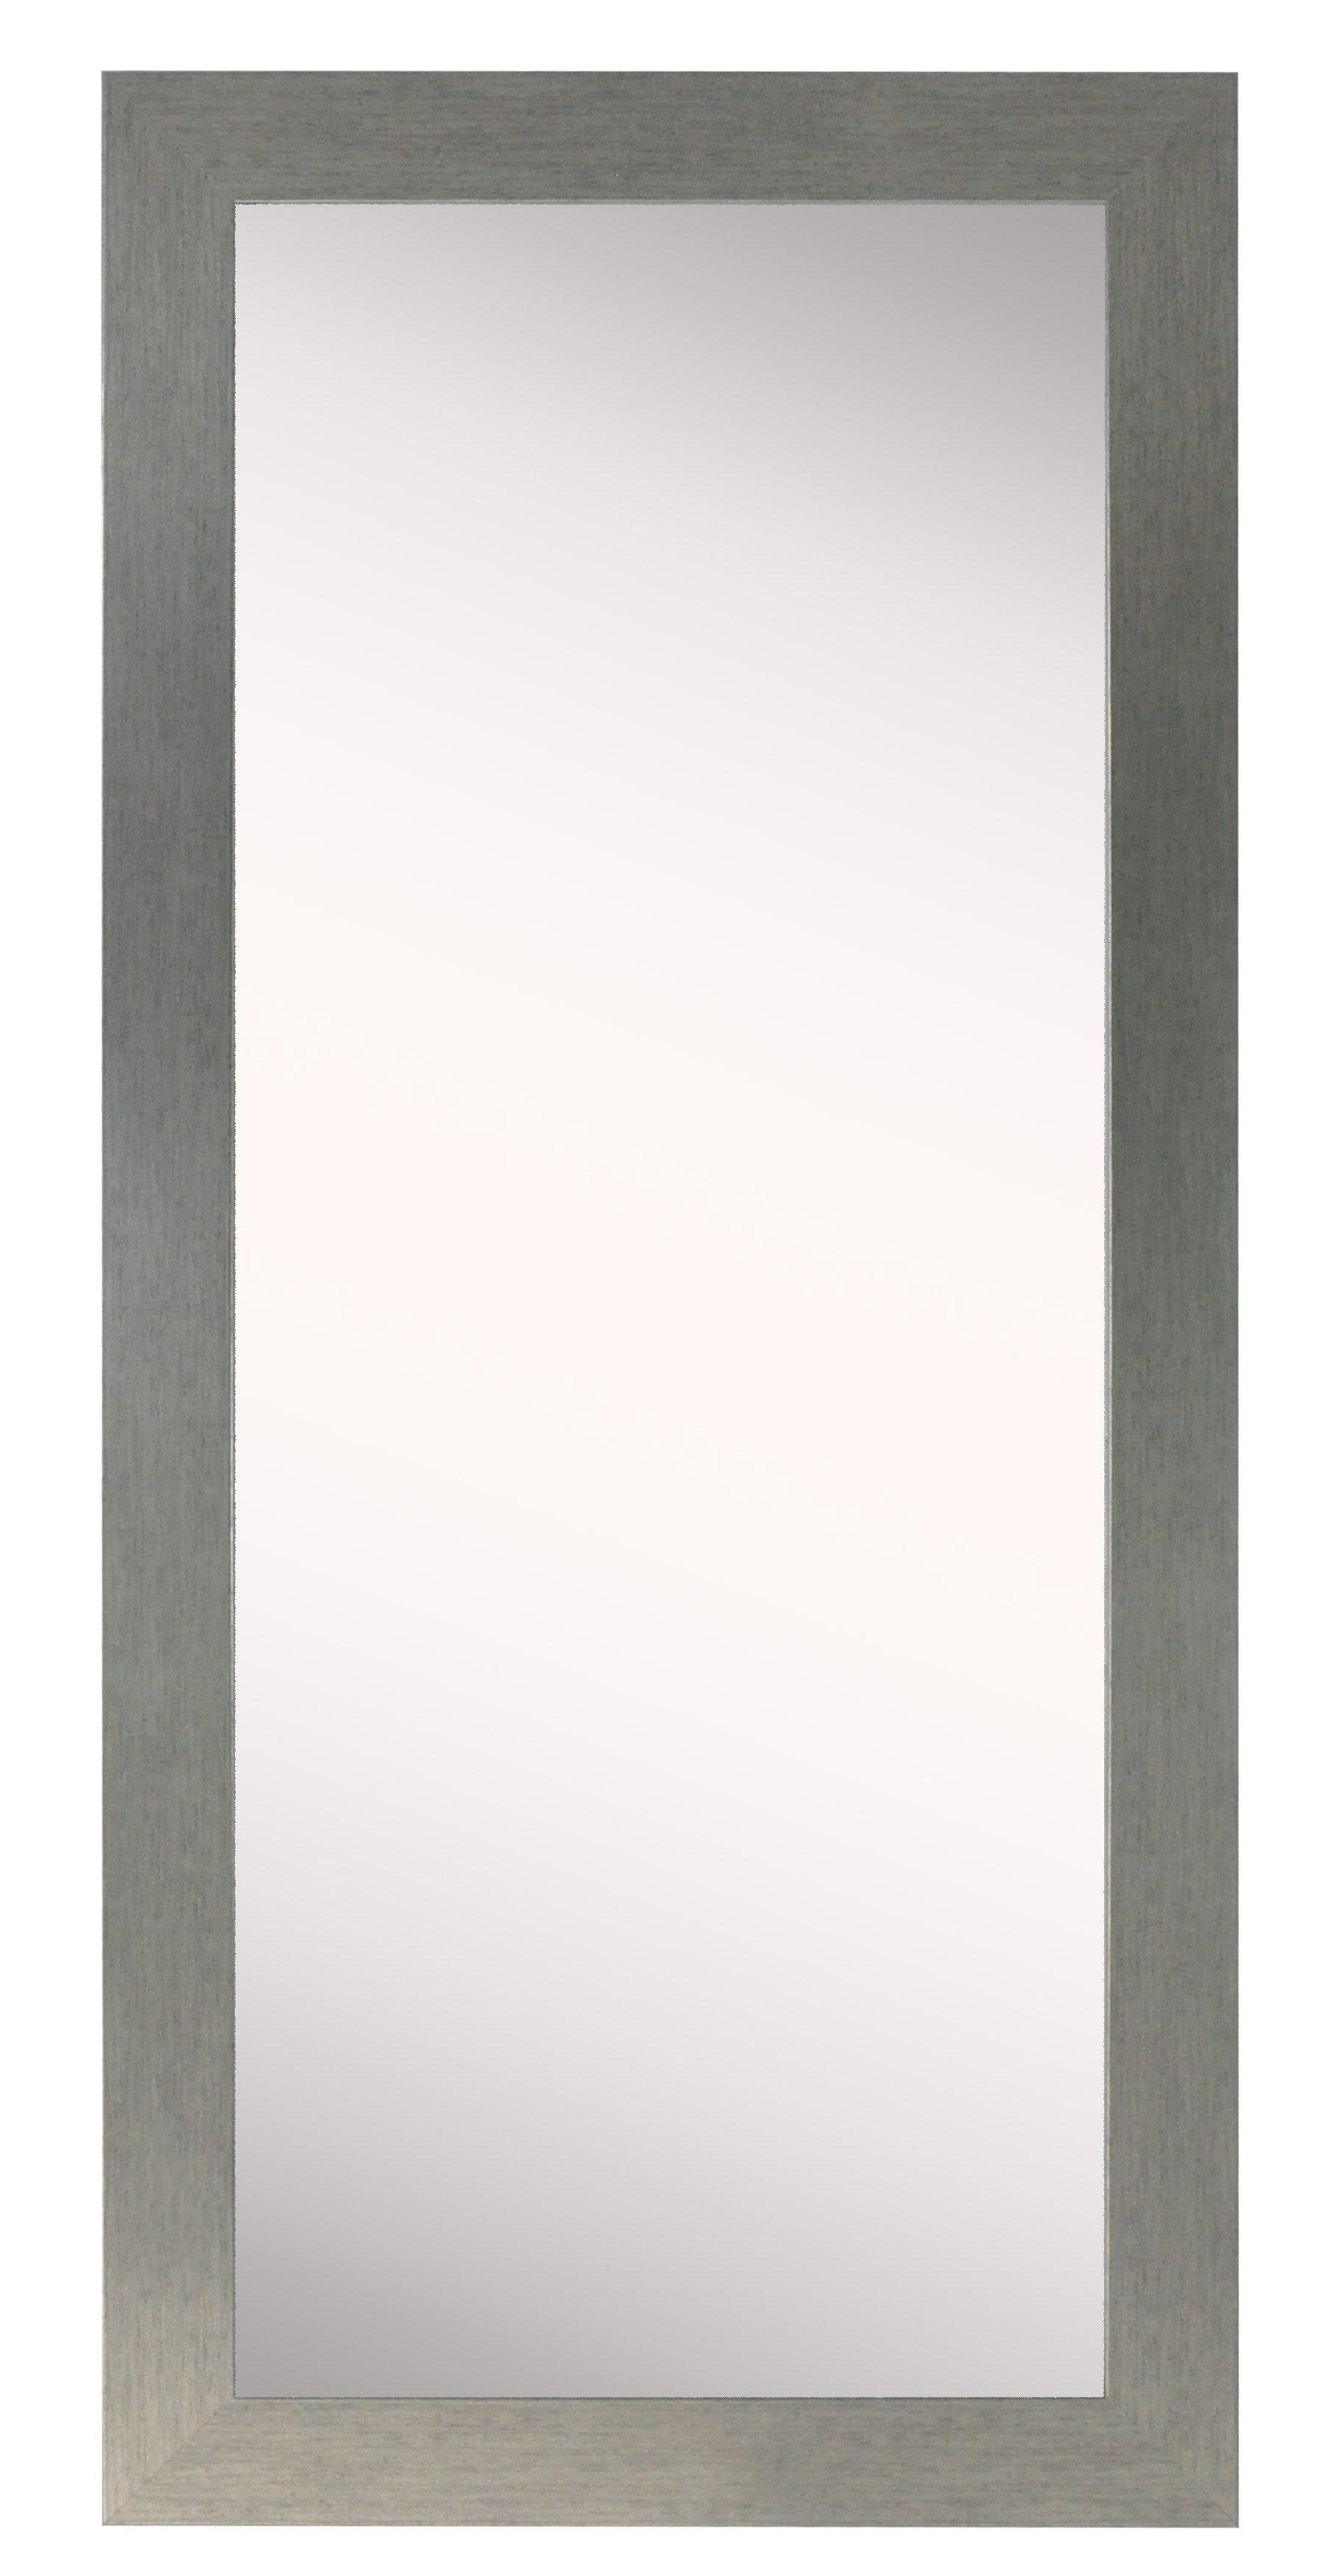 Modern Silver Bathroom Mirrors   Allmodern Inside Sartain Modern & Contemporary Wall Mirrors (View 5 of 20)